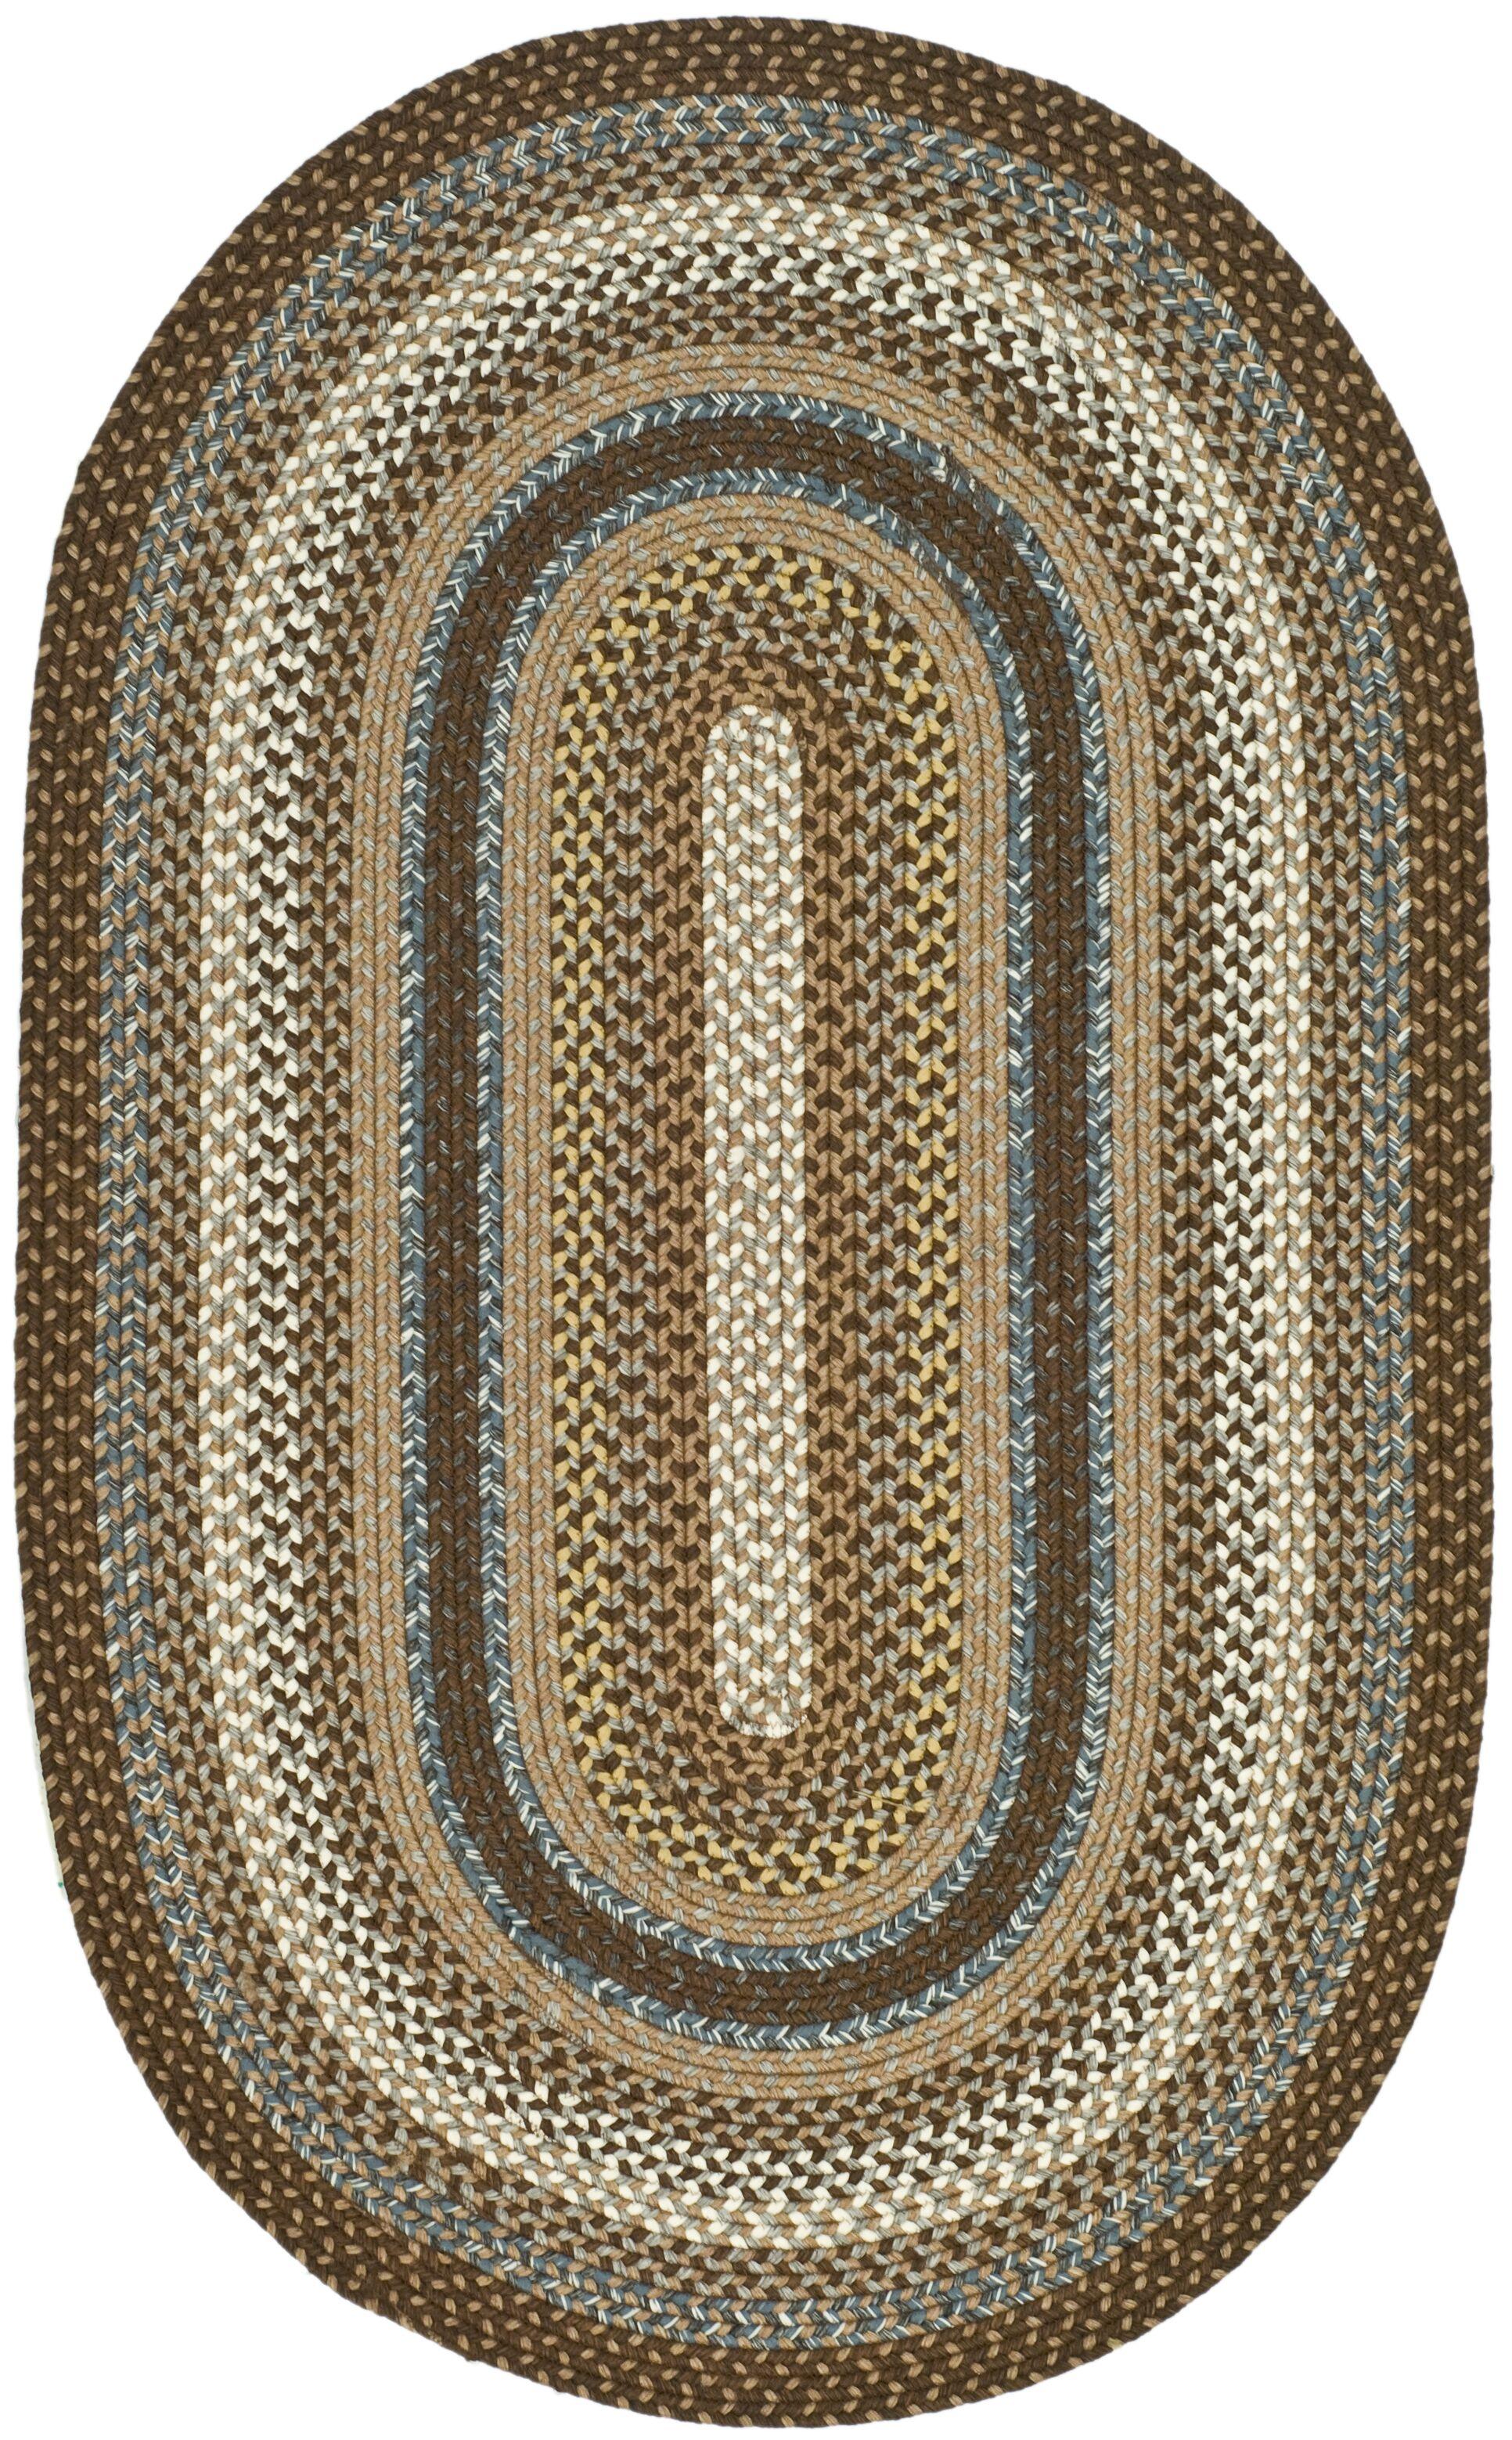 Liptak Hand-Braided Brown Area Rug Rug Size: Oval 4' x 6'